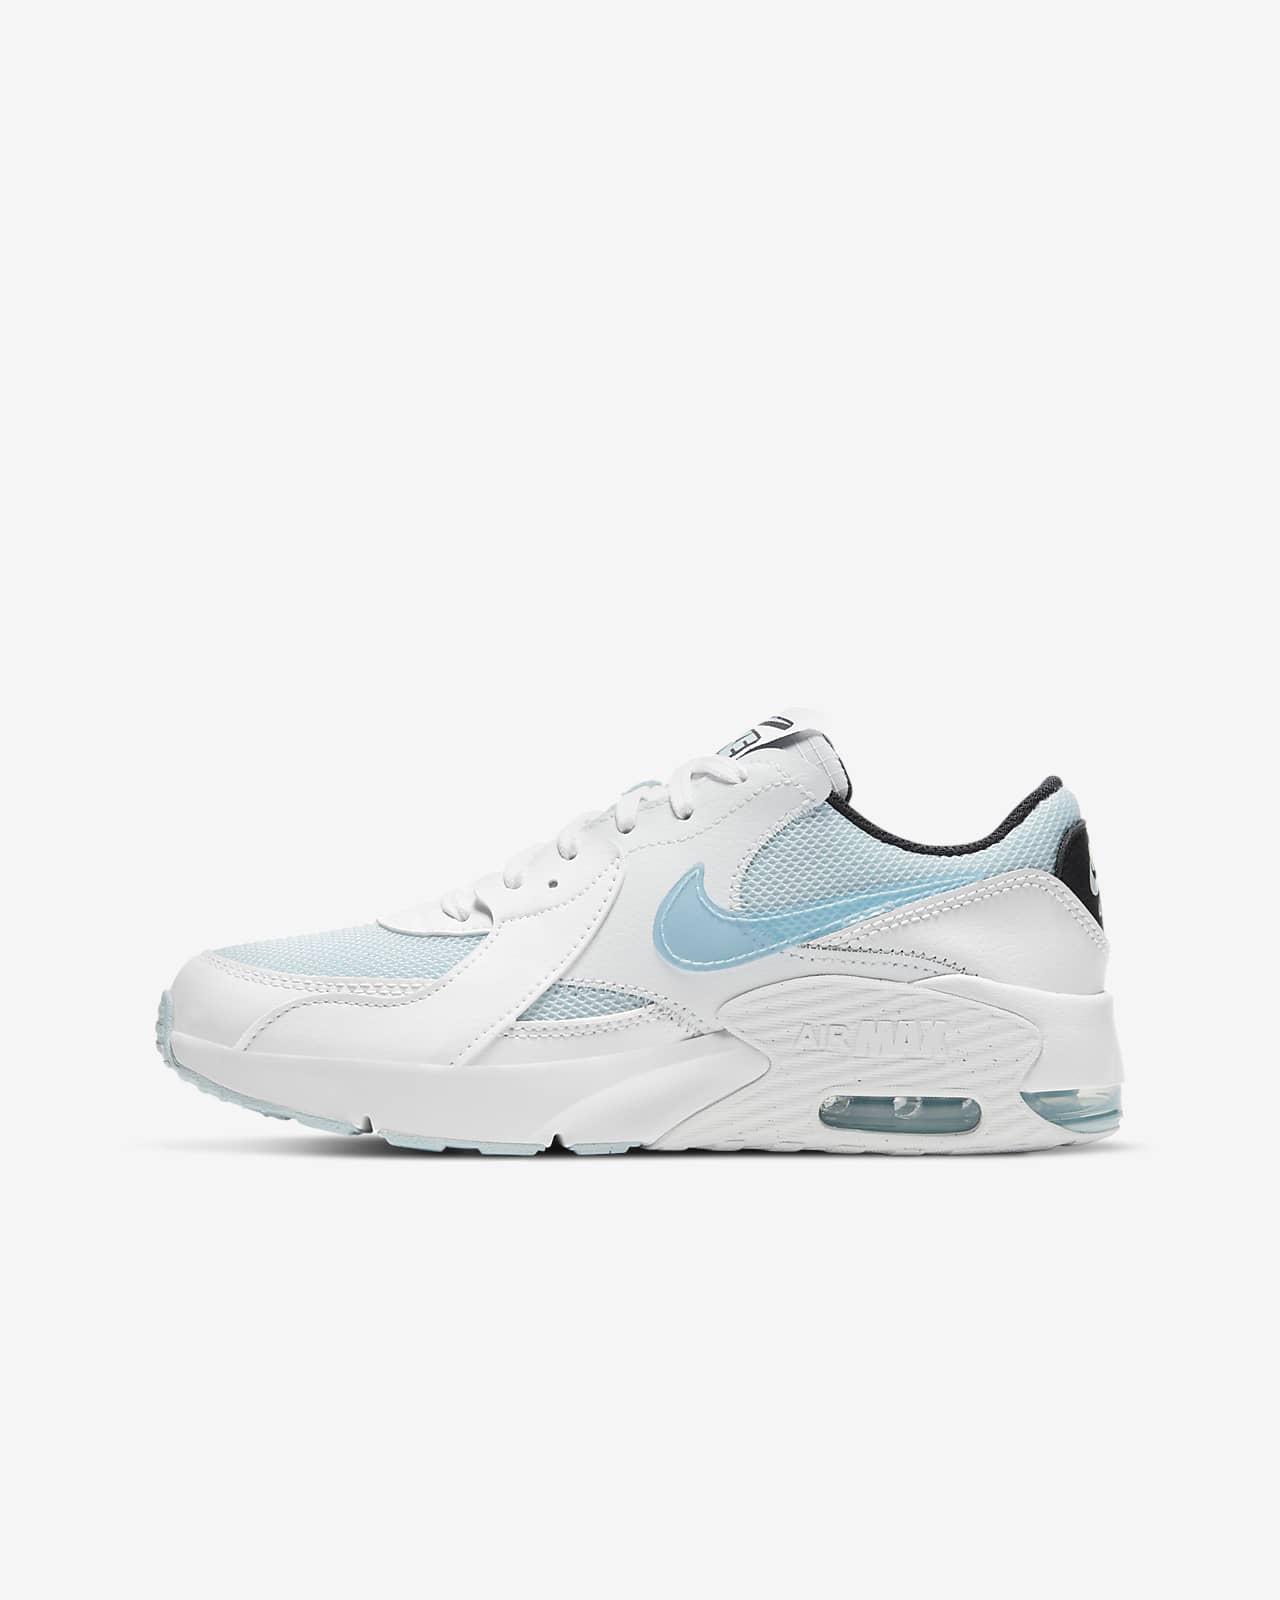 Nike Air Max Excee Power Up Big Kids' Shoe